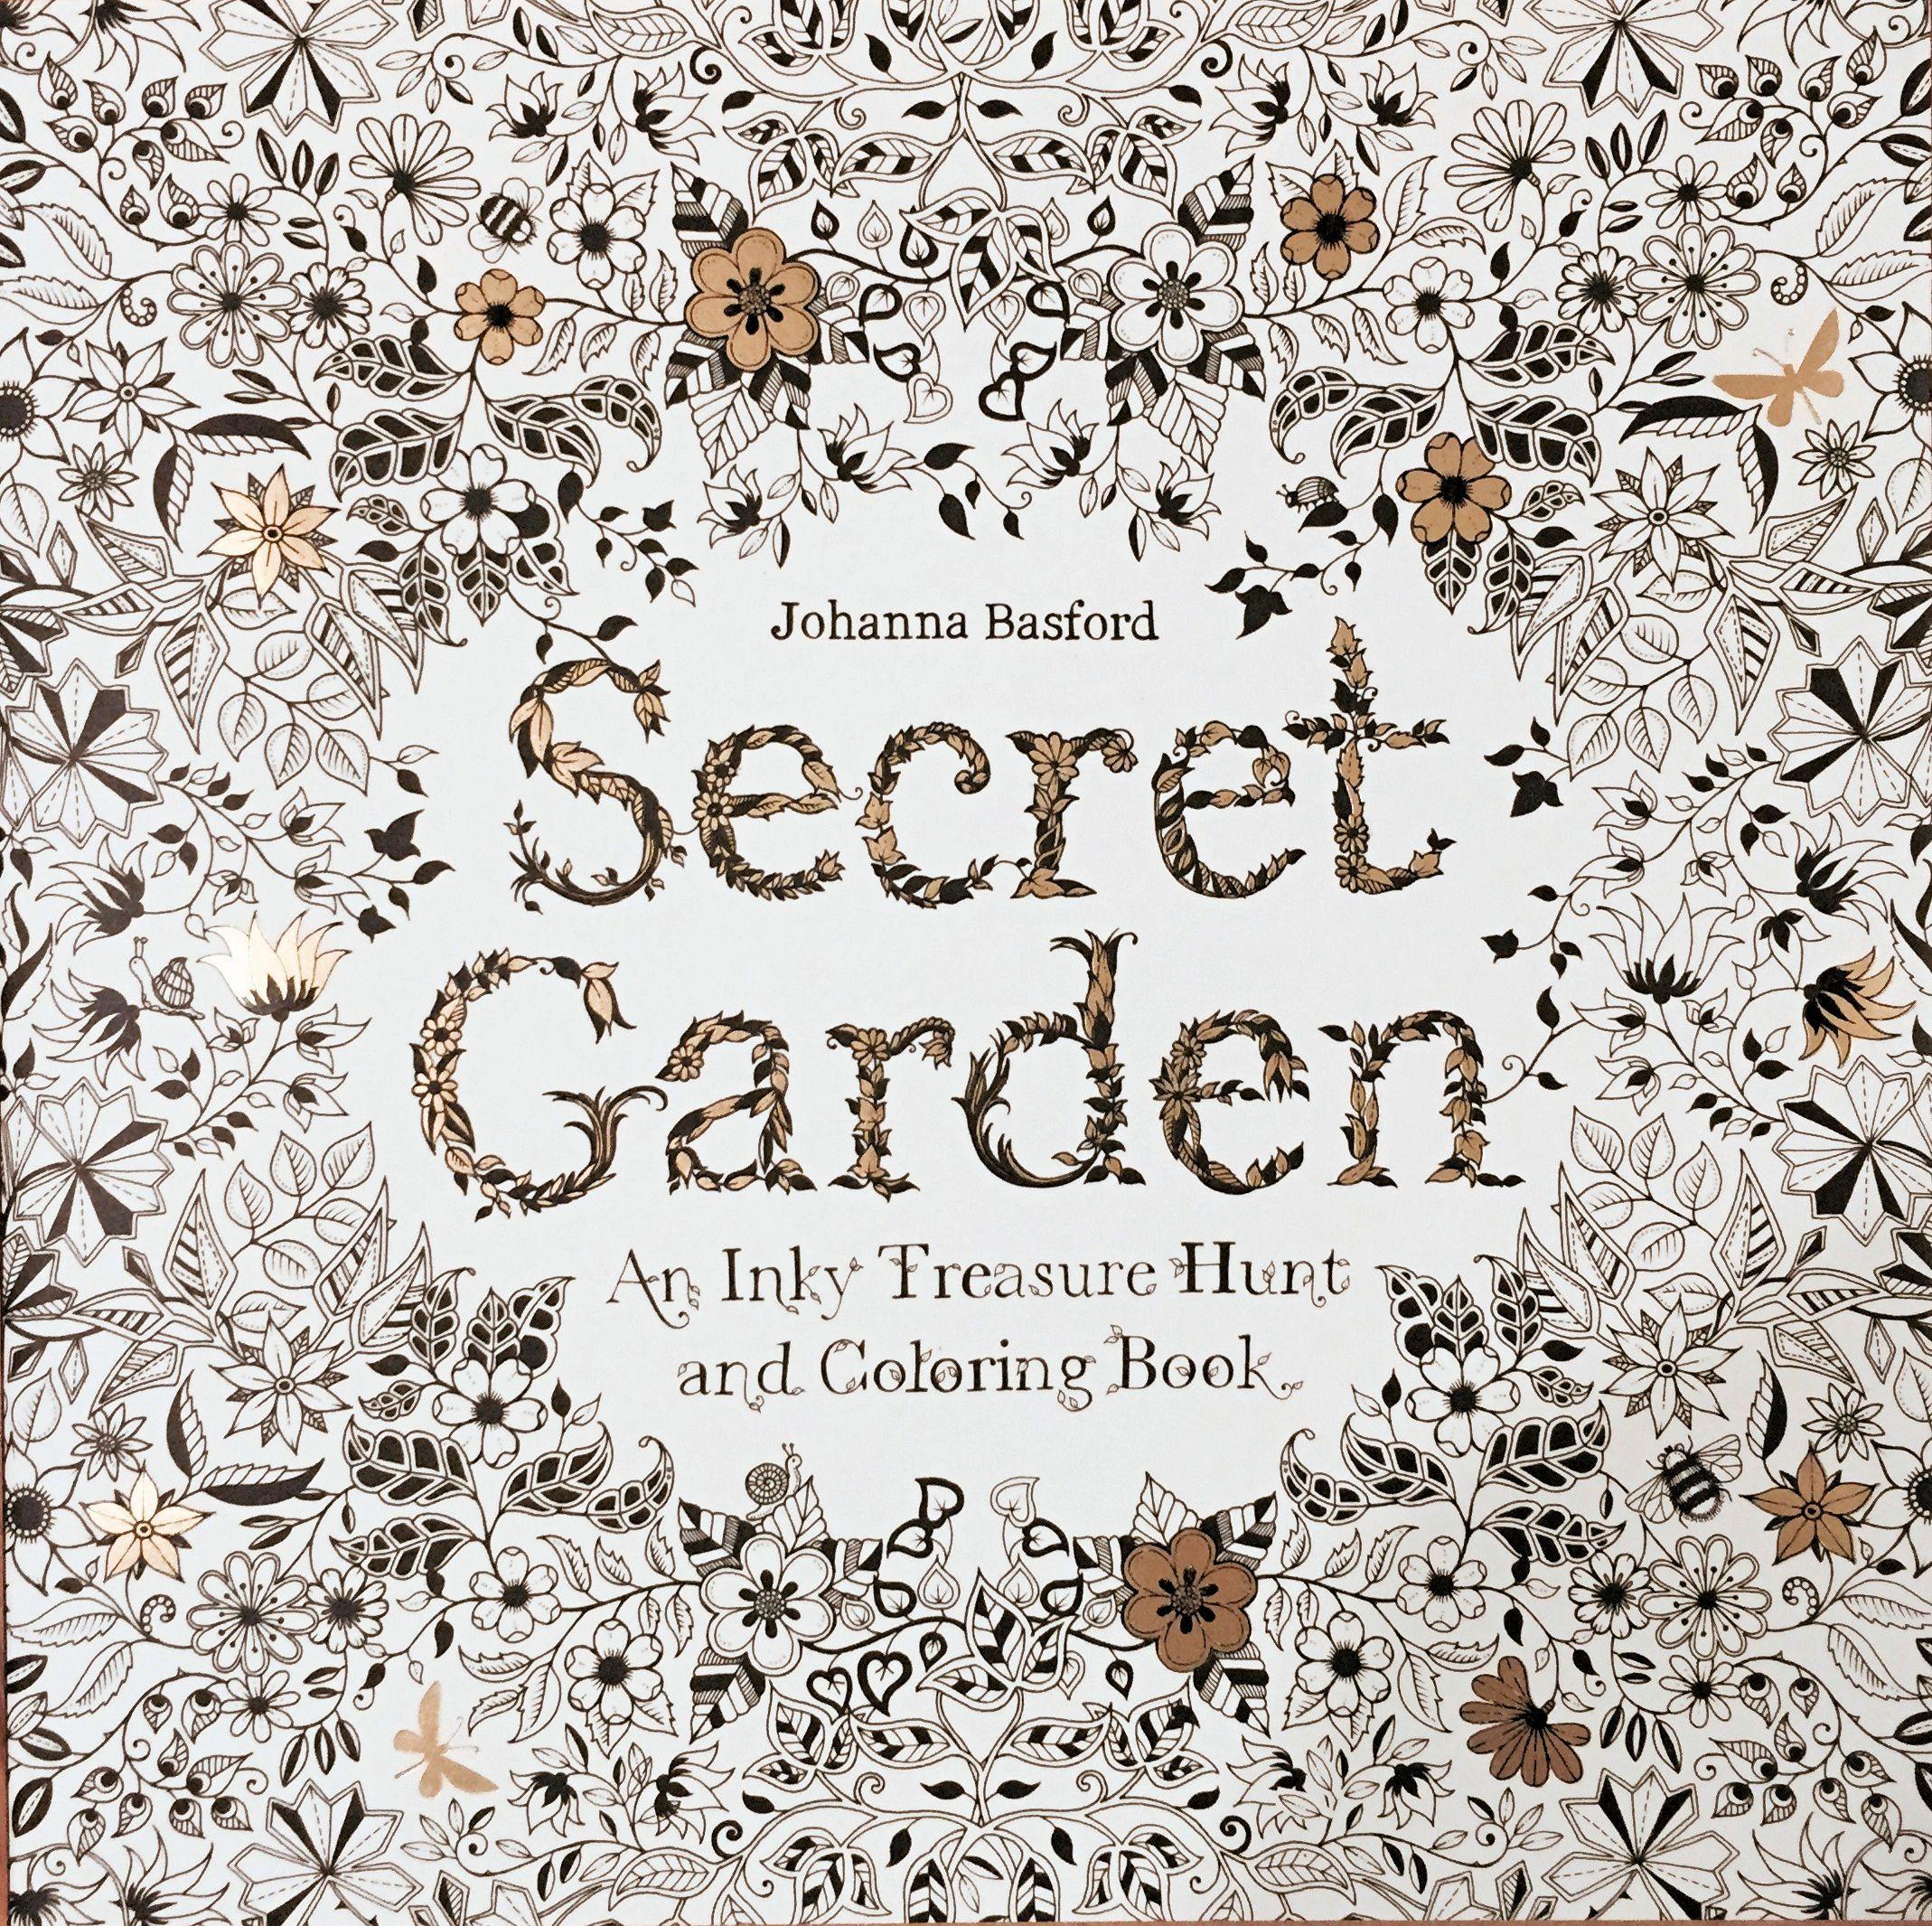 Secret Garden By Johanna Basford Adult Coloring Book